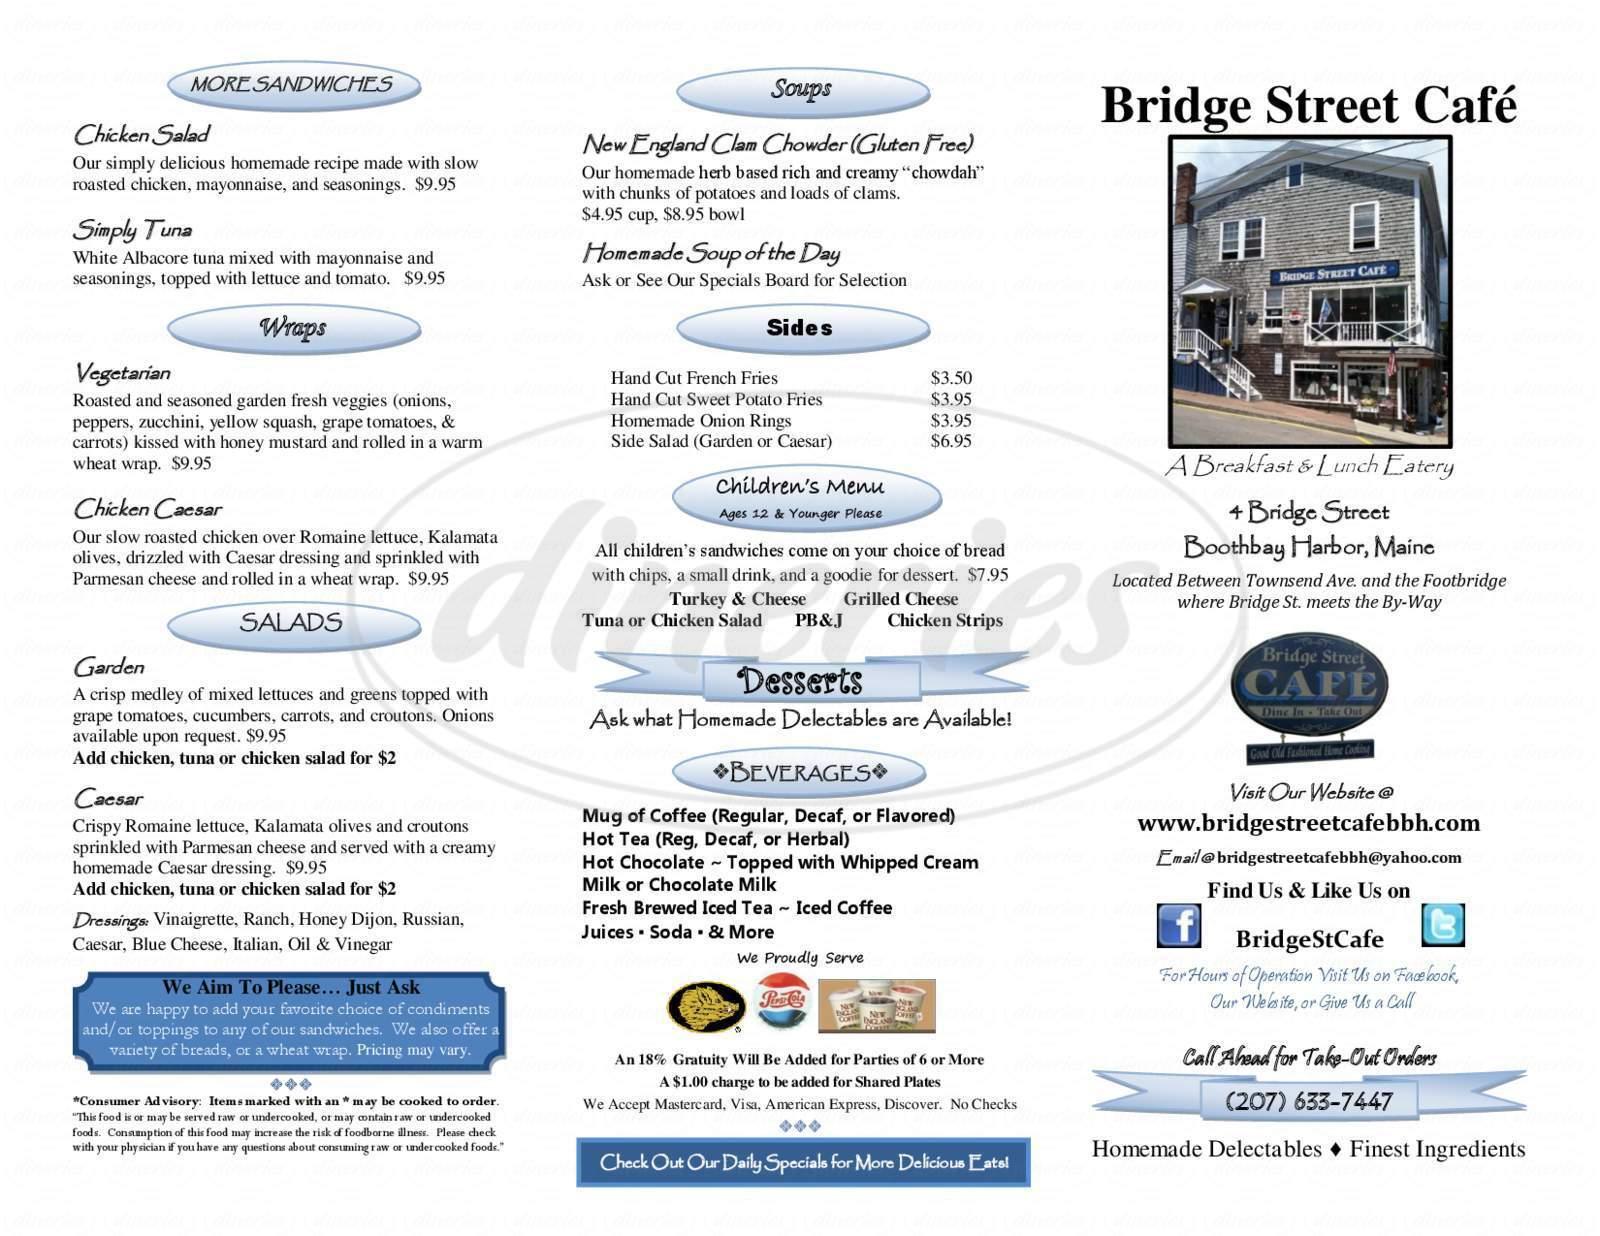 menu for Bridge Street Cafe